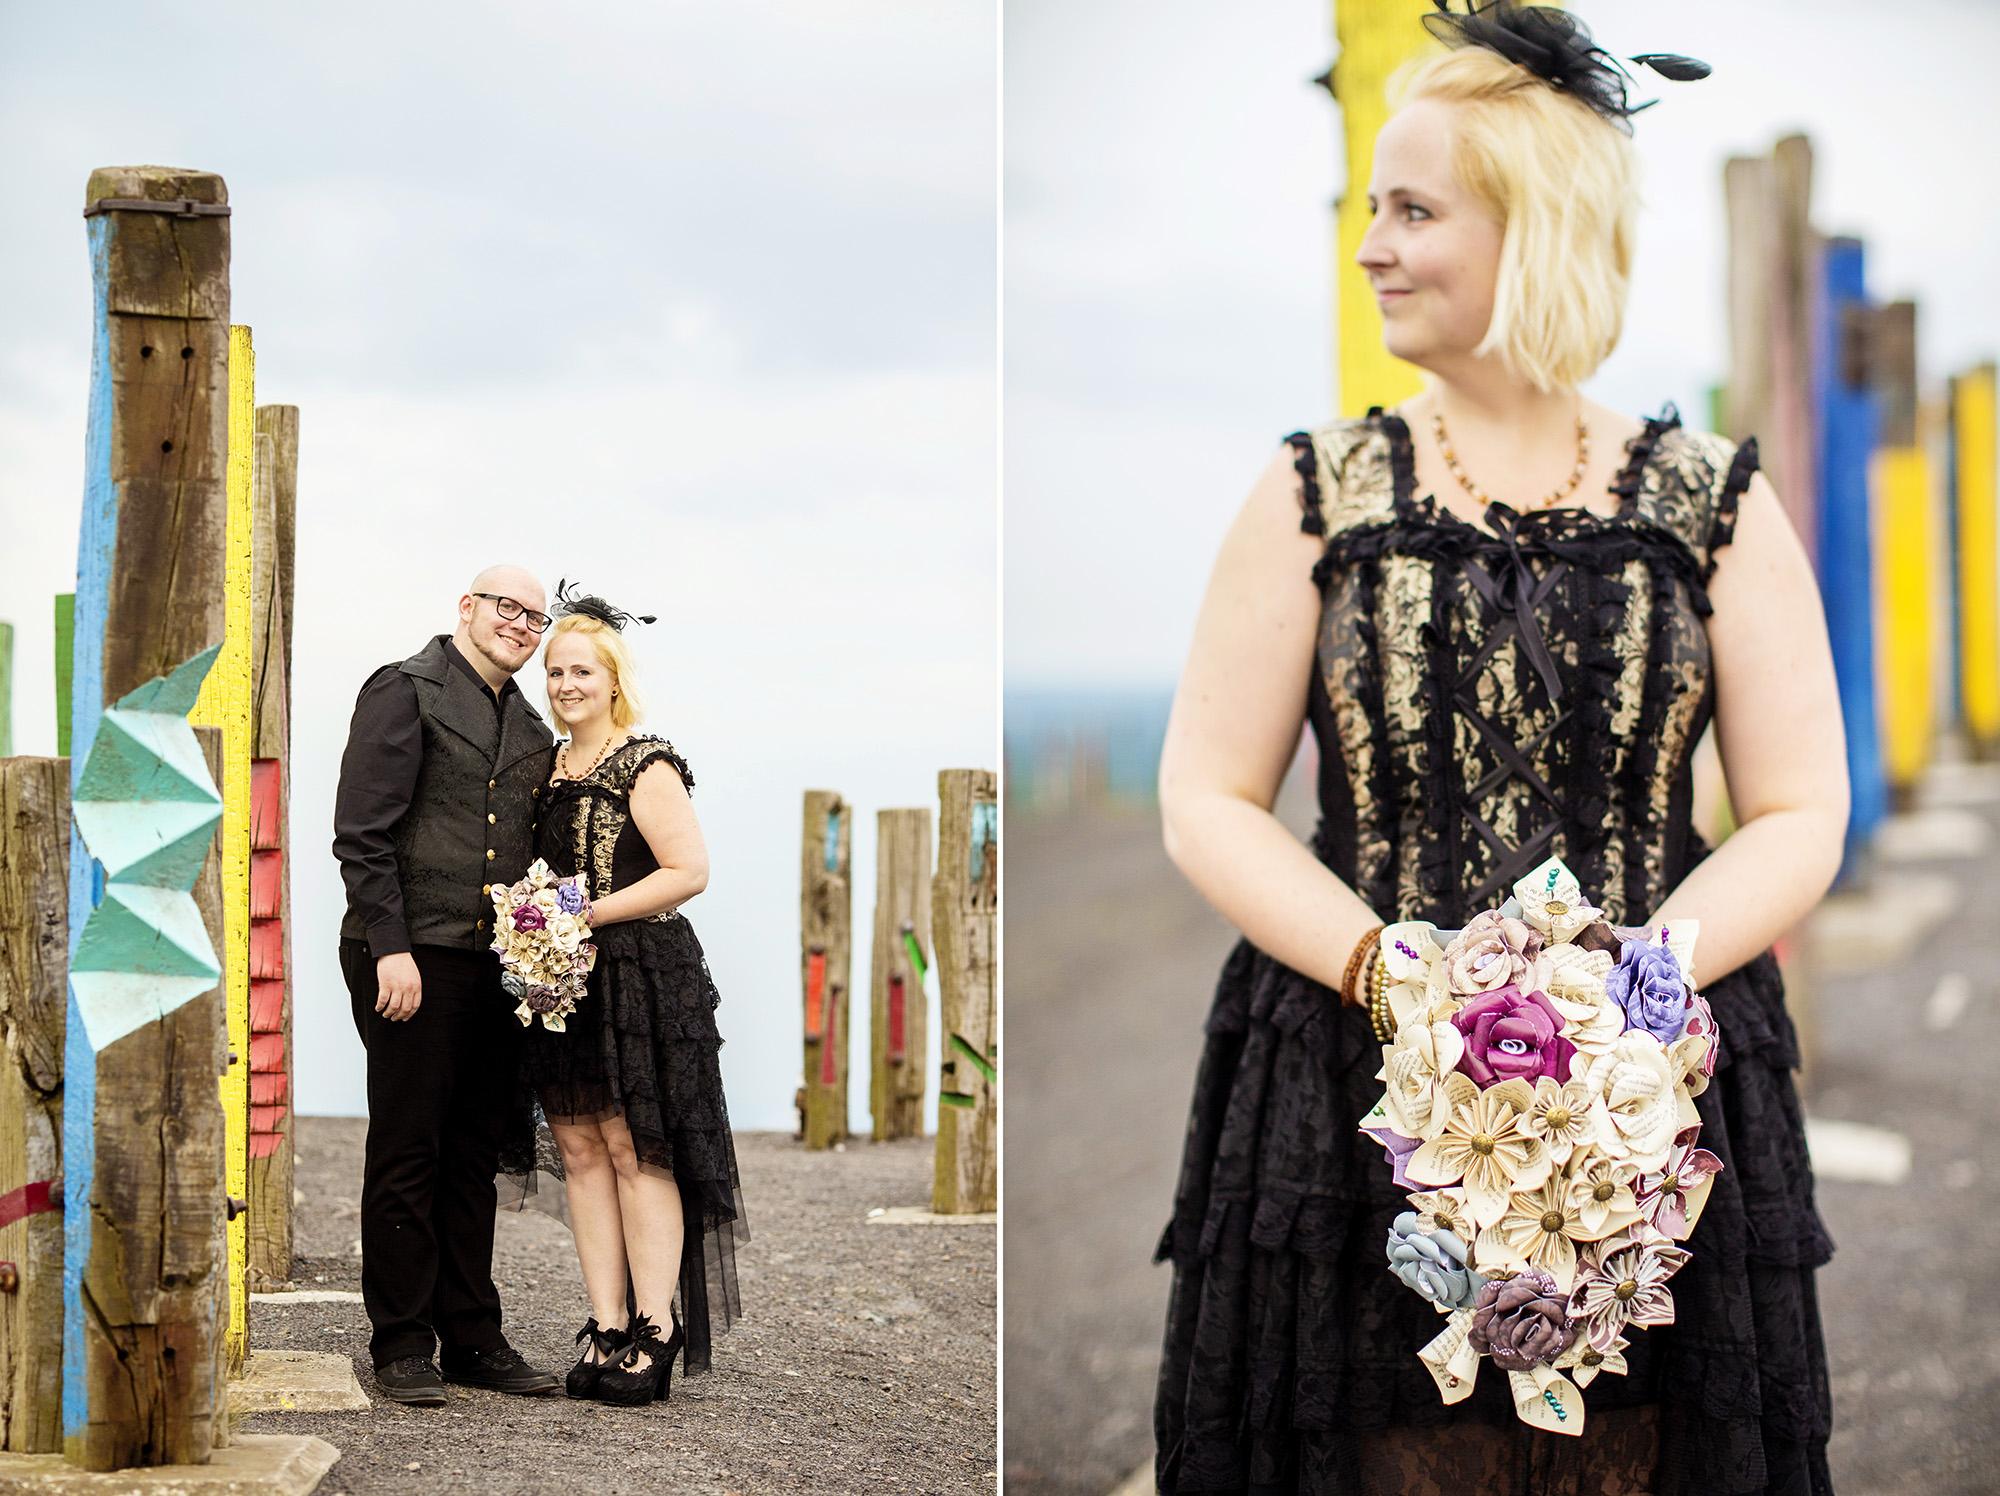 Seriously_Sabrina_Photography_Essen_Germany_RocknRoll_Hochzeit_Wedding_PatrickJenny184.jpg